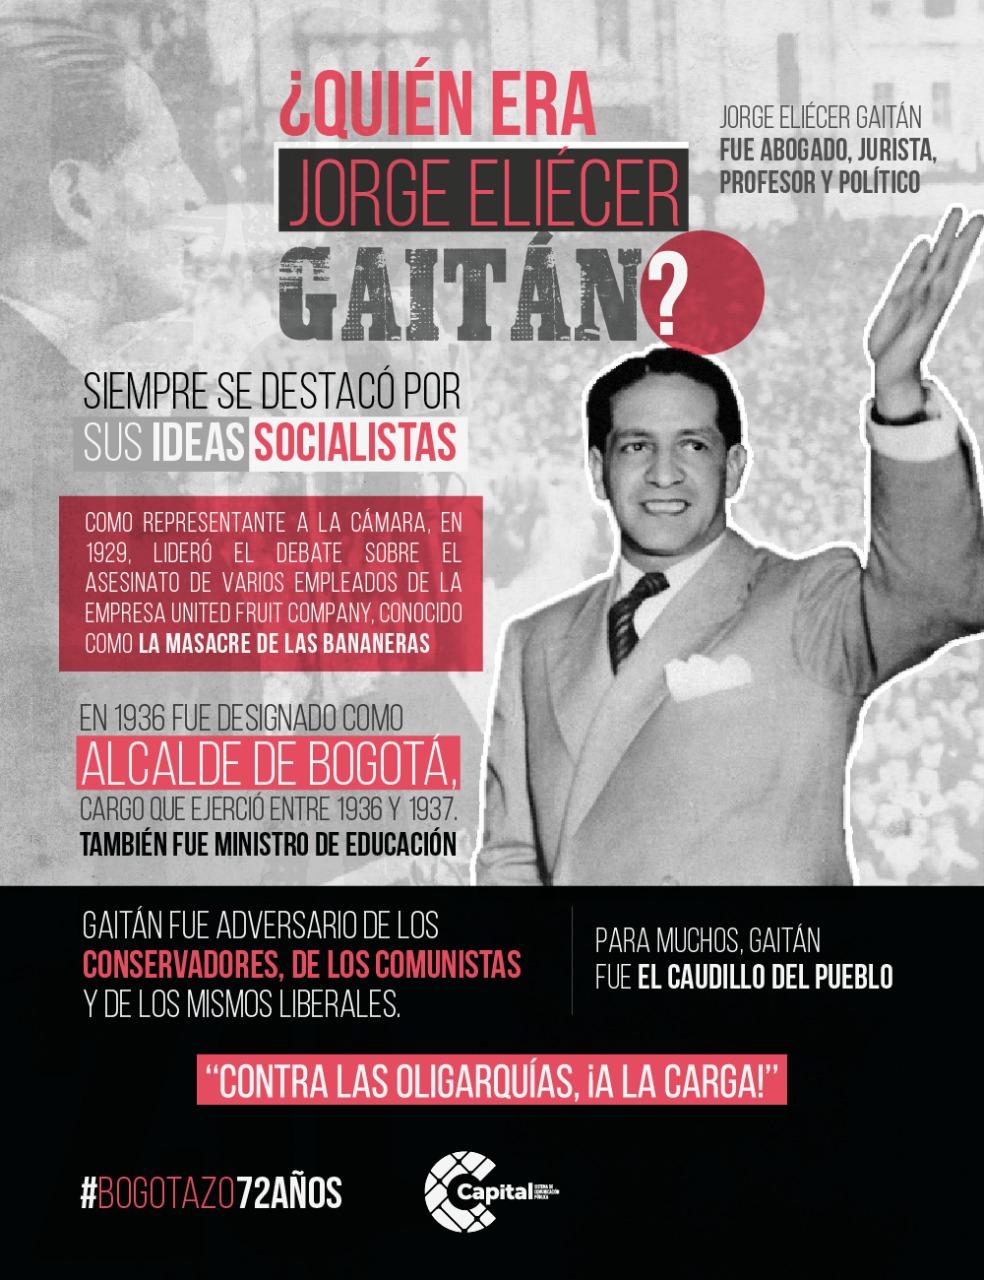 ¿Quién era Jorge Eliécer Gaitán?